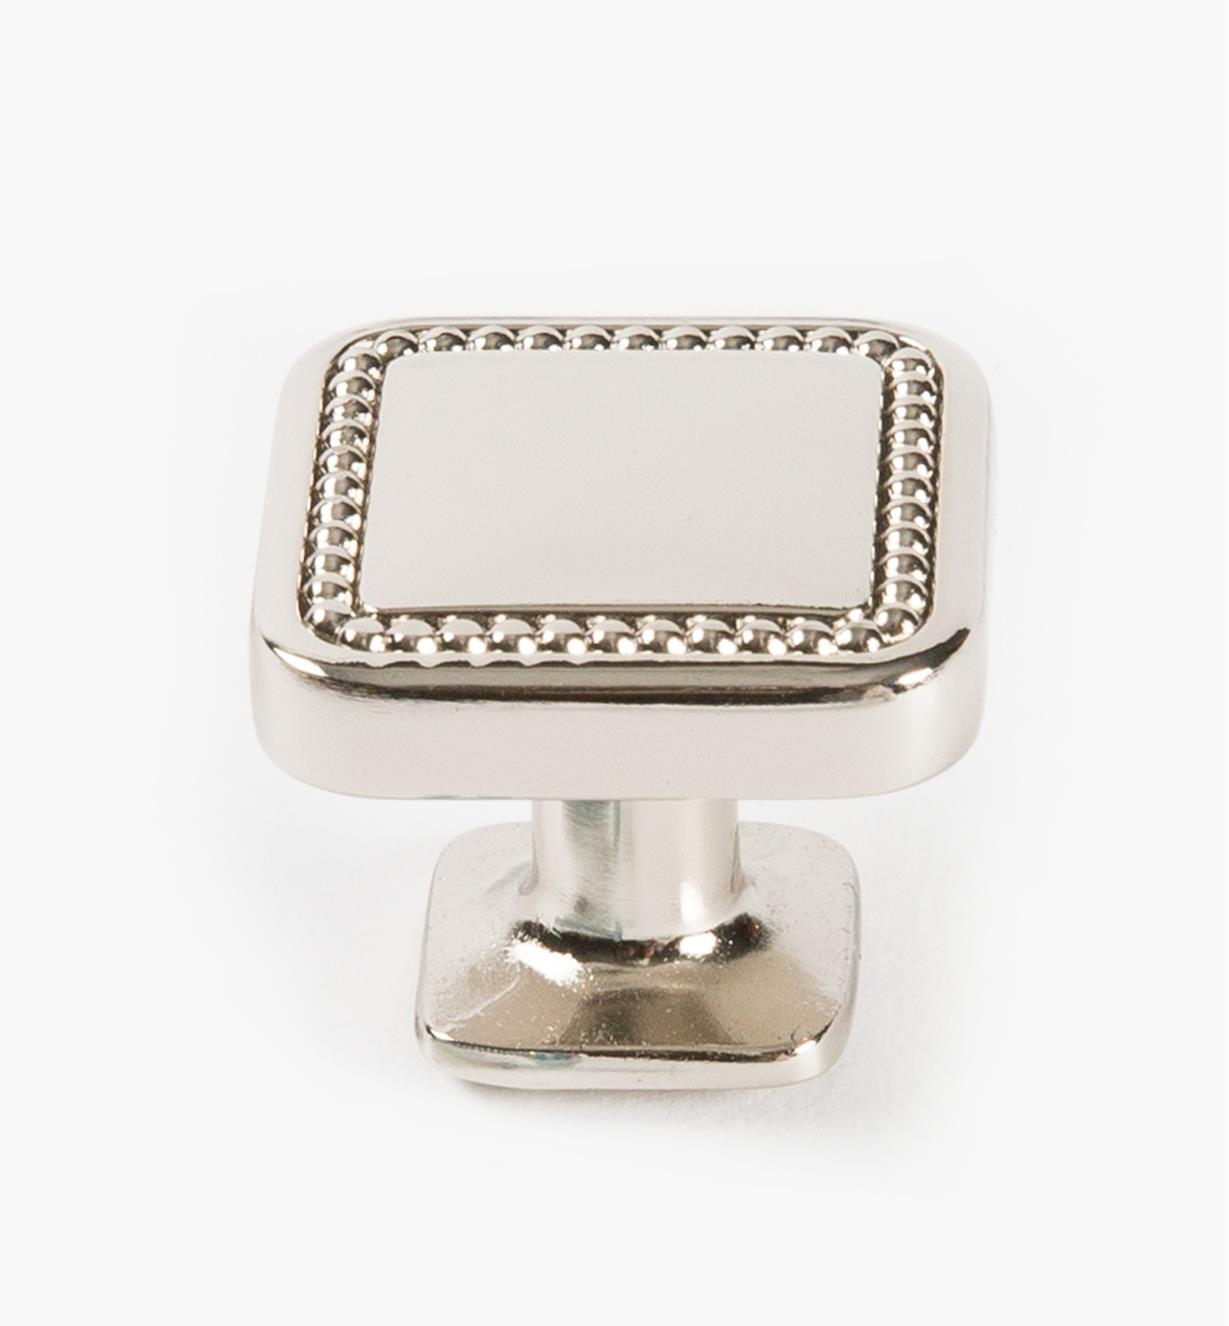 02A1635 - Bouton carré Carolyne, 32mm (1 1/4 po), nickel poli, l'unité